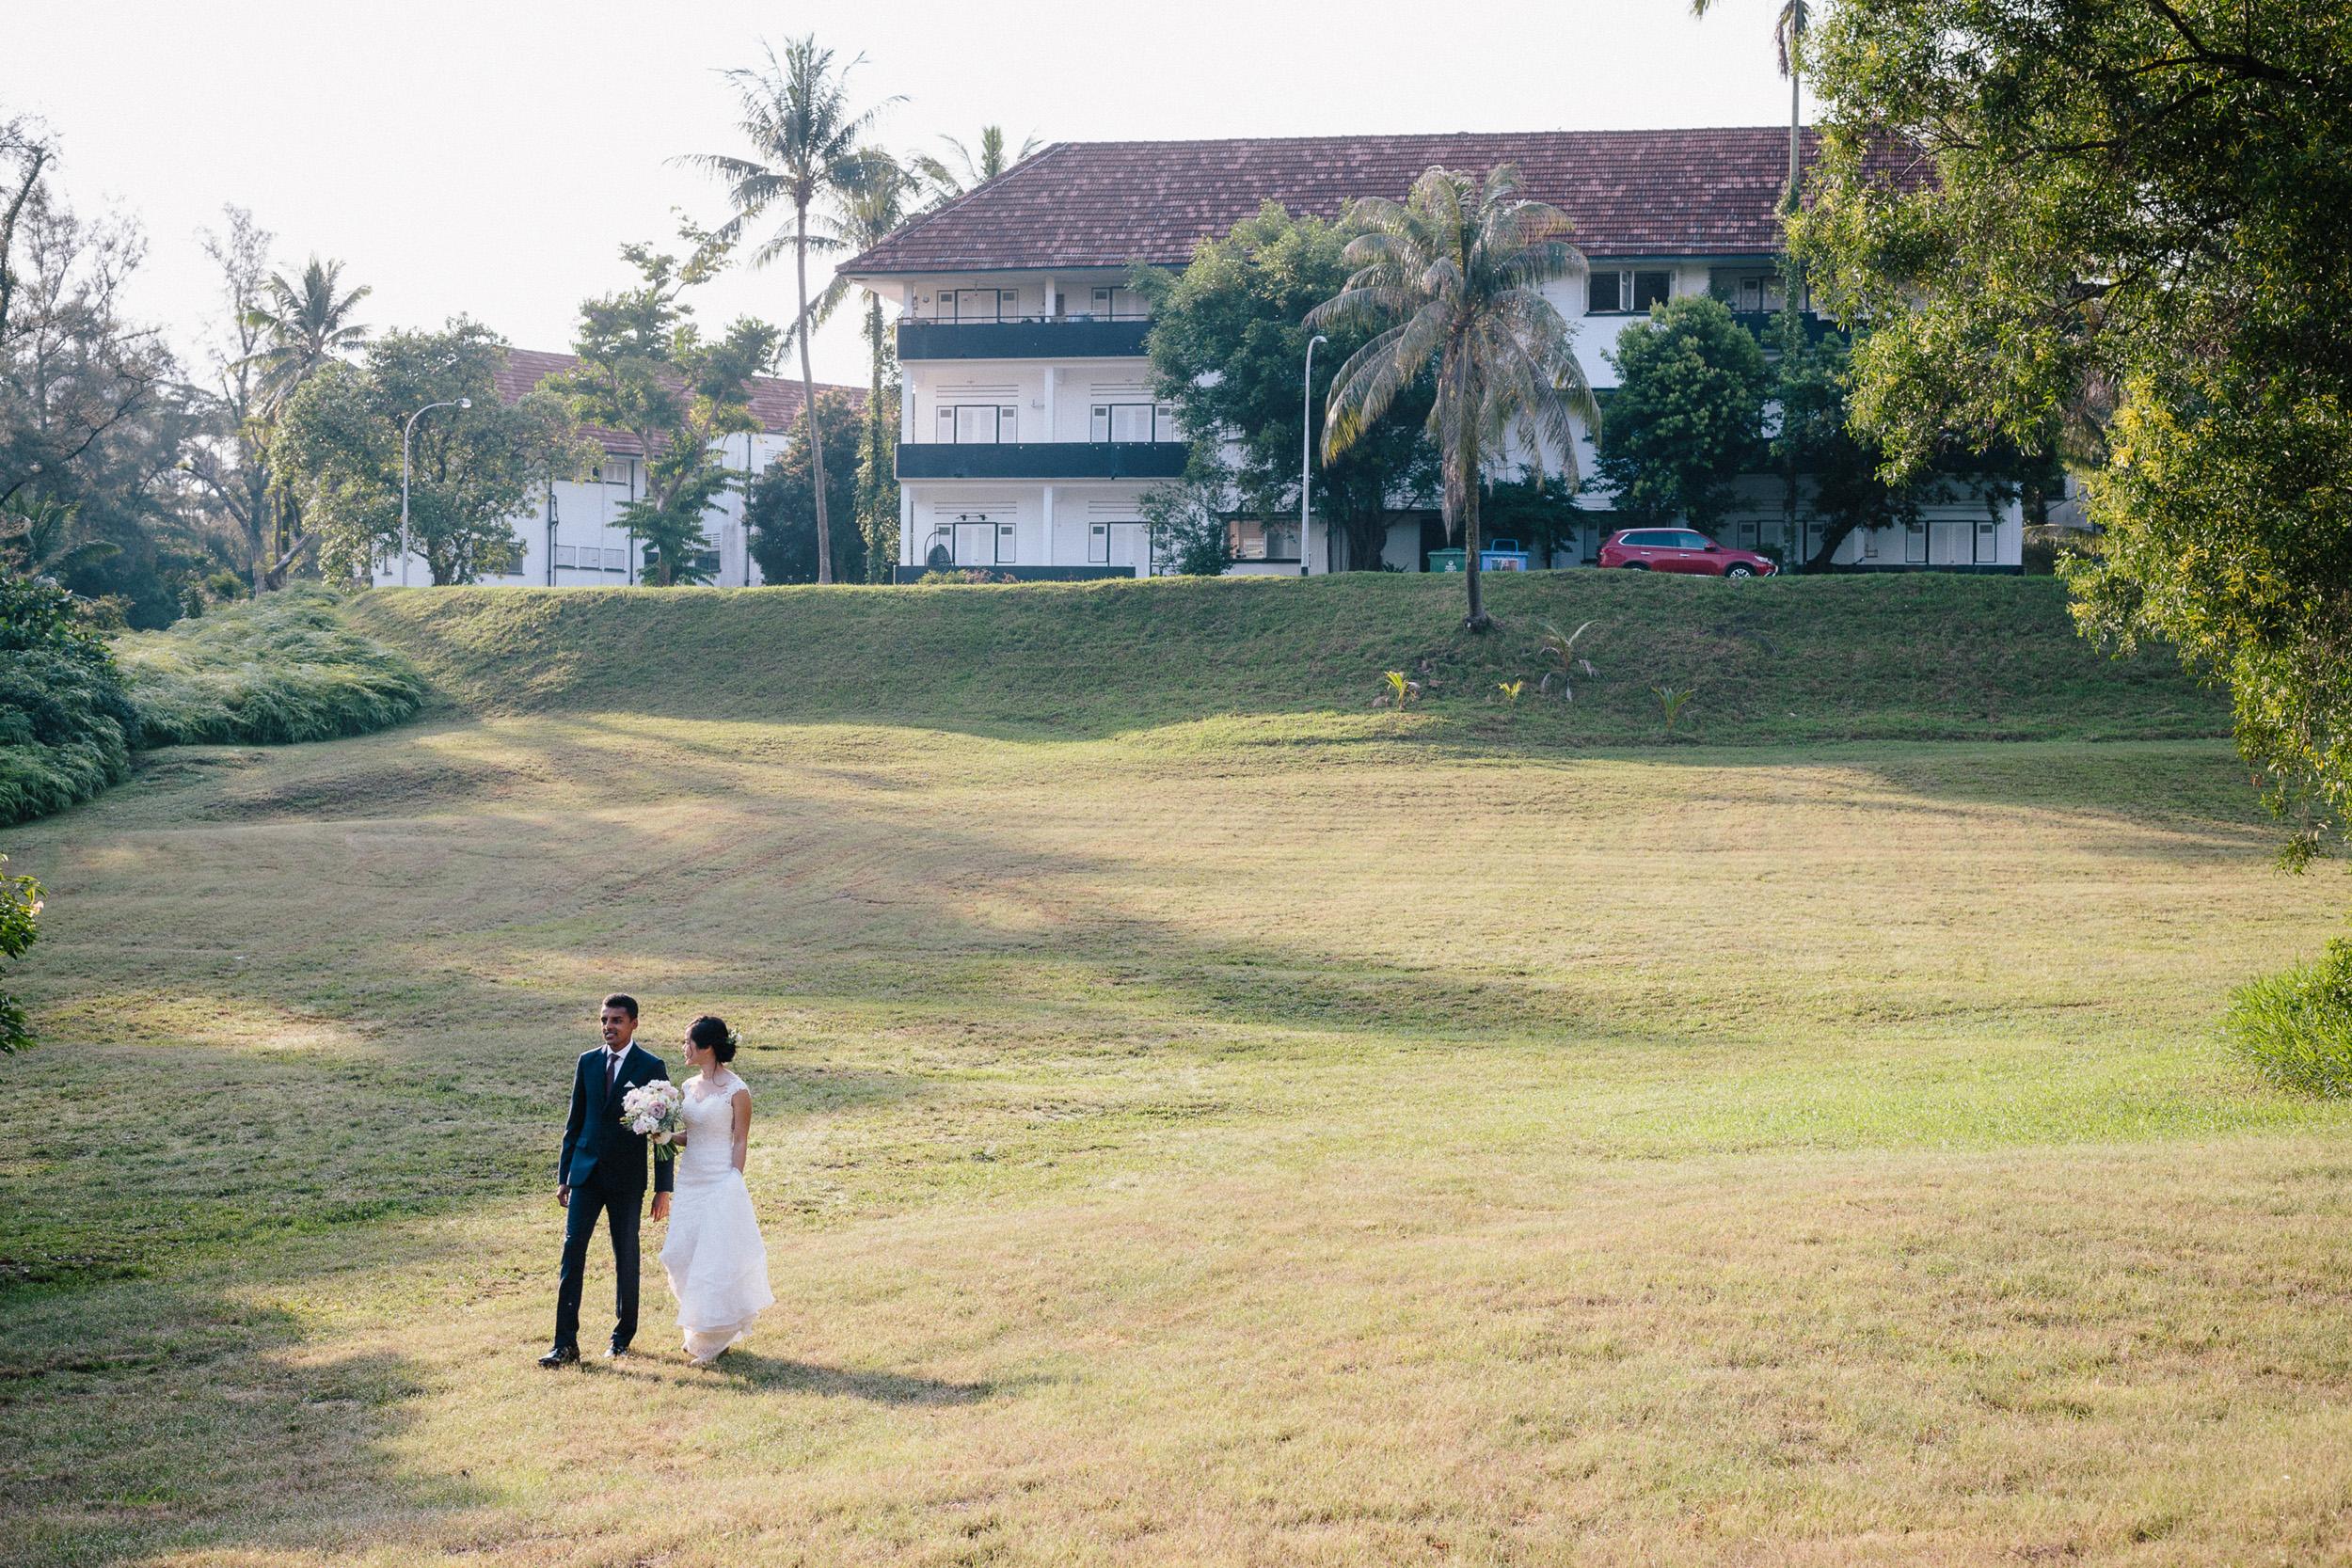 singapore-wedding-photographer-photography-wmt2017-132.jpg